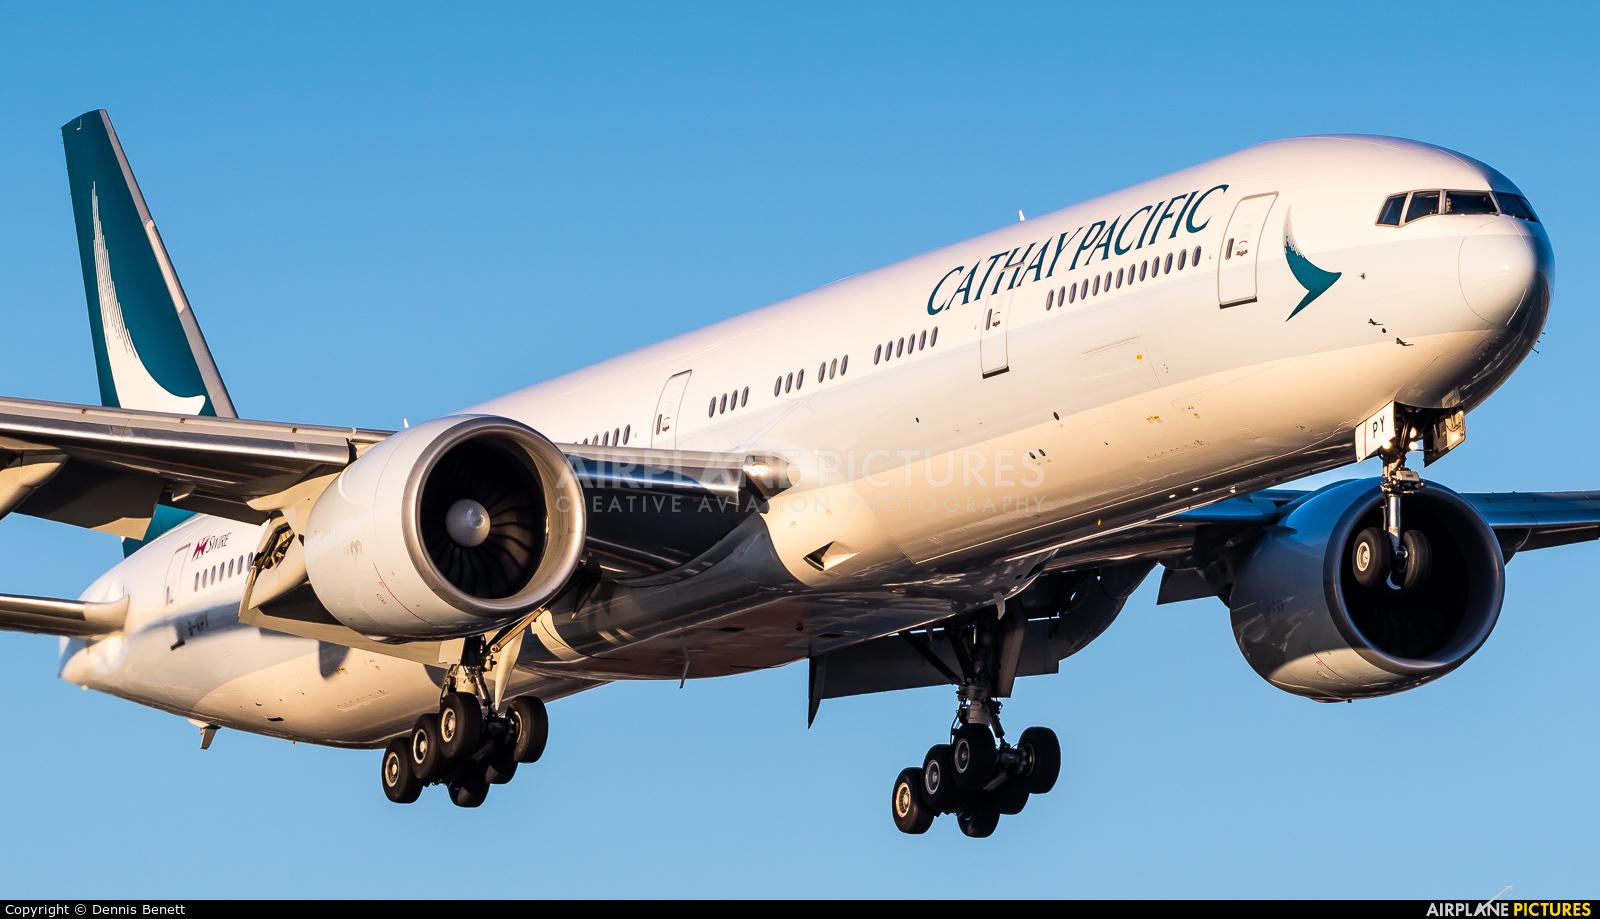 Cathay Pacific B-KPY aircraft at Toronto - Pearson Intl, ON